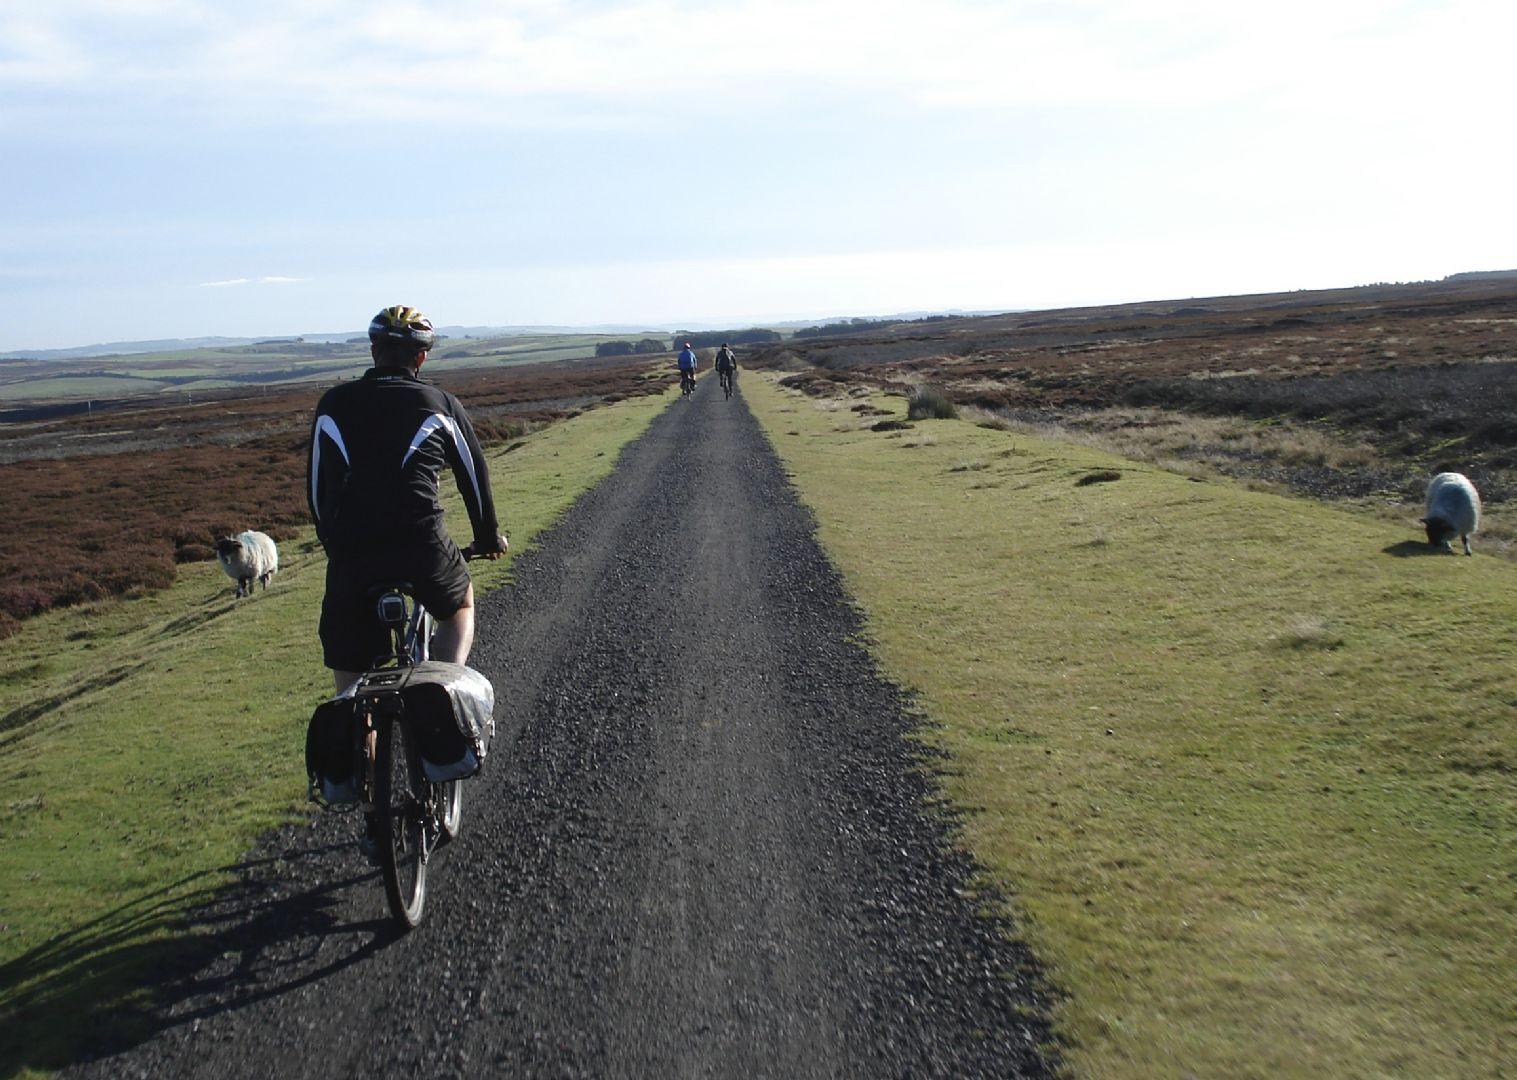 5041588518_ce57f30d82_o.jpg - UK - C2C - Coast to Coast 4 Days Cycling - Self-Guided Leisure Cycling Holiday - Leisure Cycling